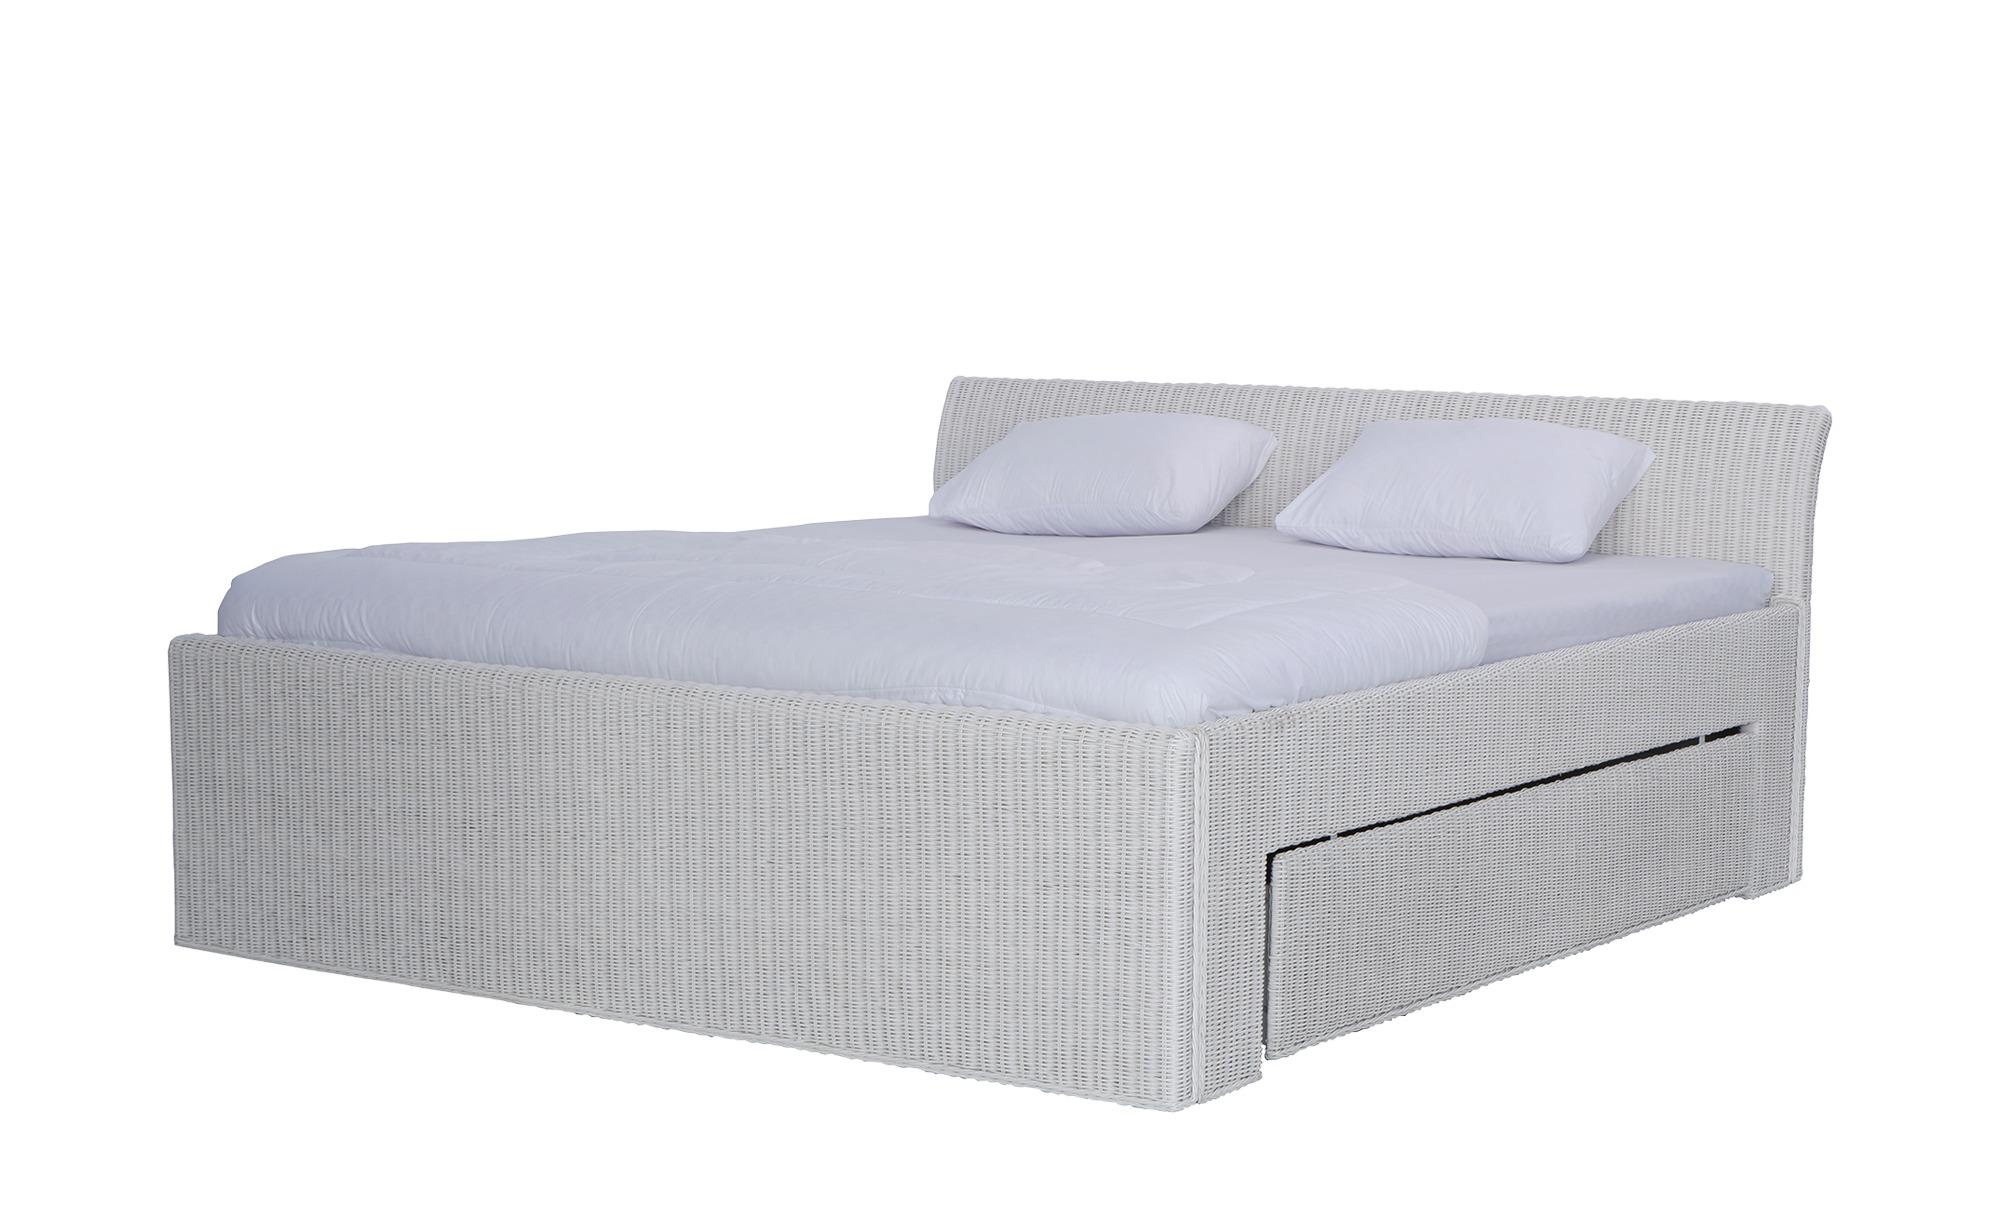 Rattan-Bettgestell - weiß - 195 cm - 85 cm - 226 cm - Betten > Bettgestelle - Möbel Kraft | Schlafzimmer > Betten > Rattanbetten | Sconto